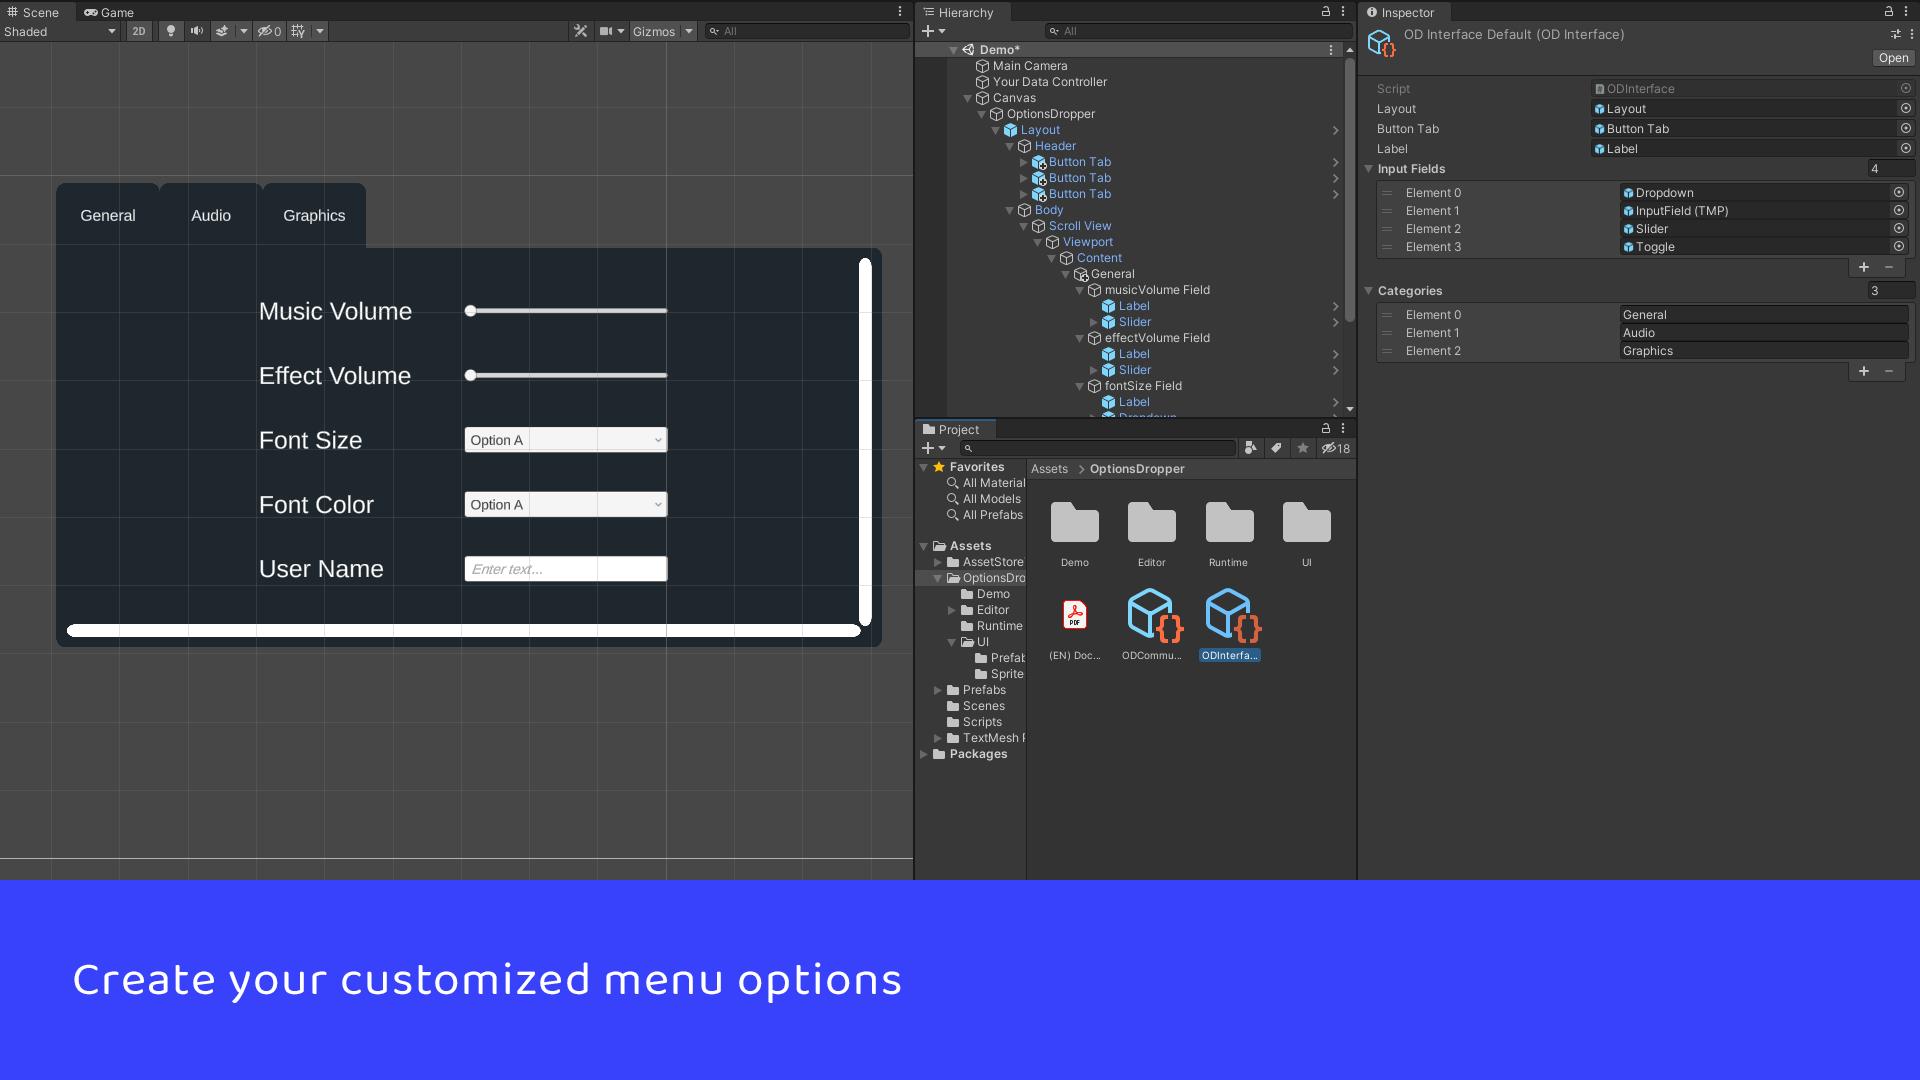 Create your customized menu options